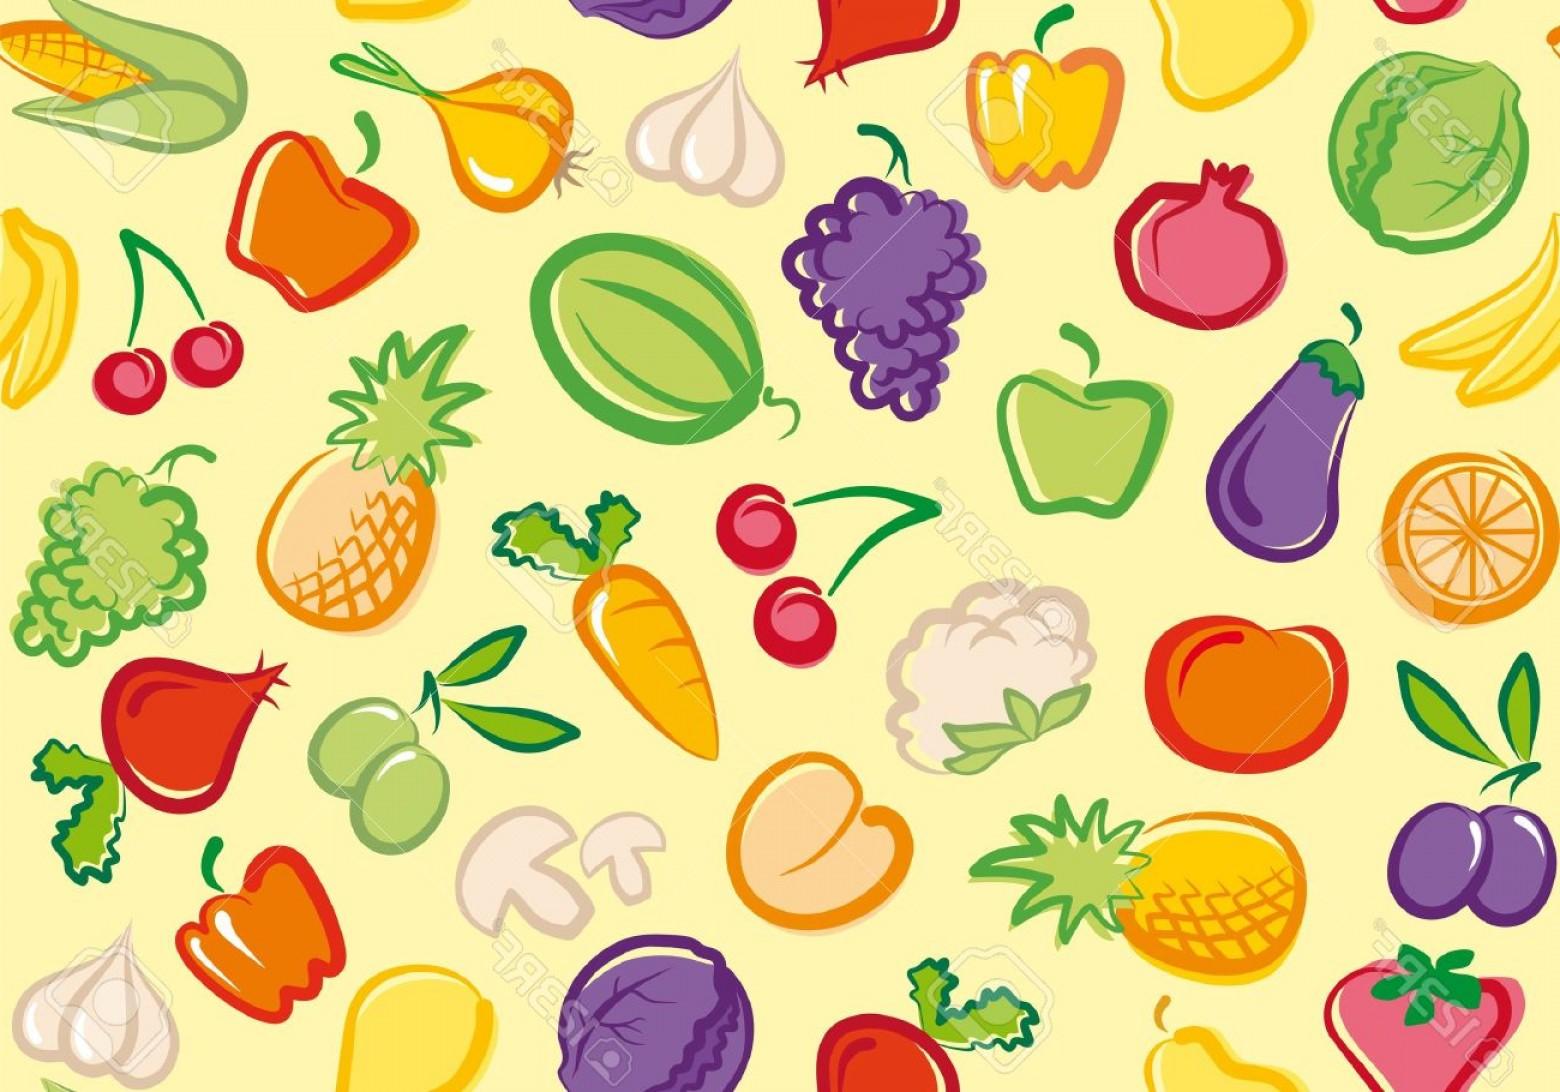 Vegetables clipart wallpaper, Vegetables wallpaper.